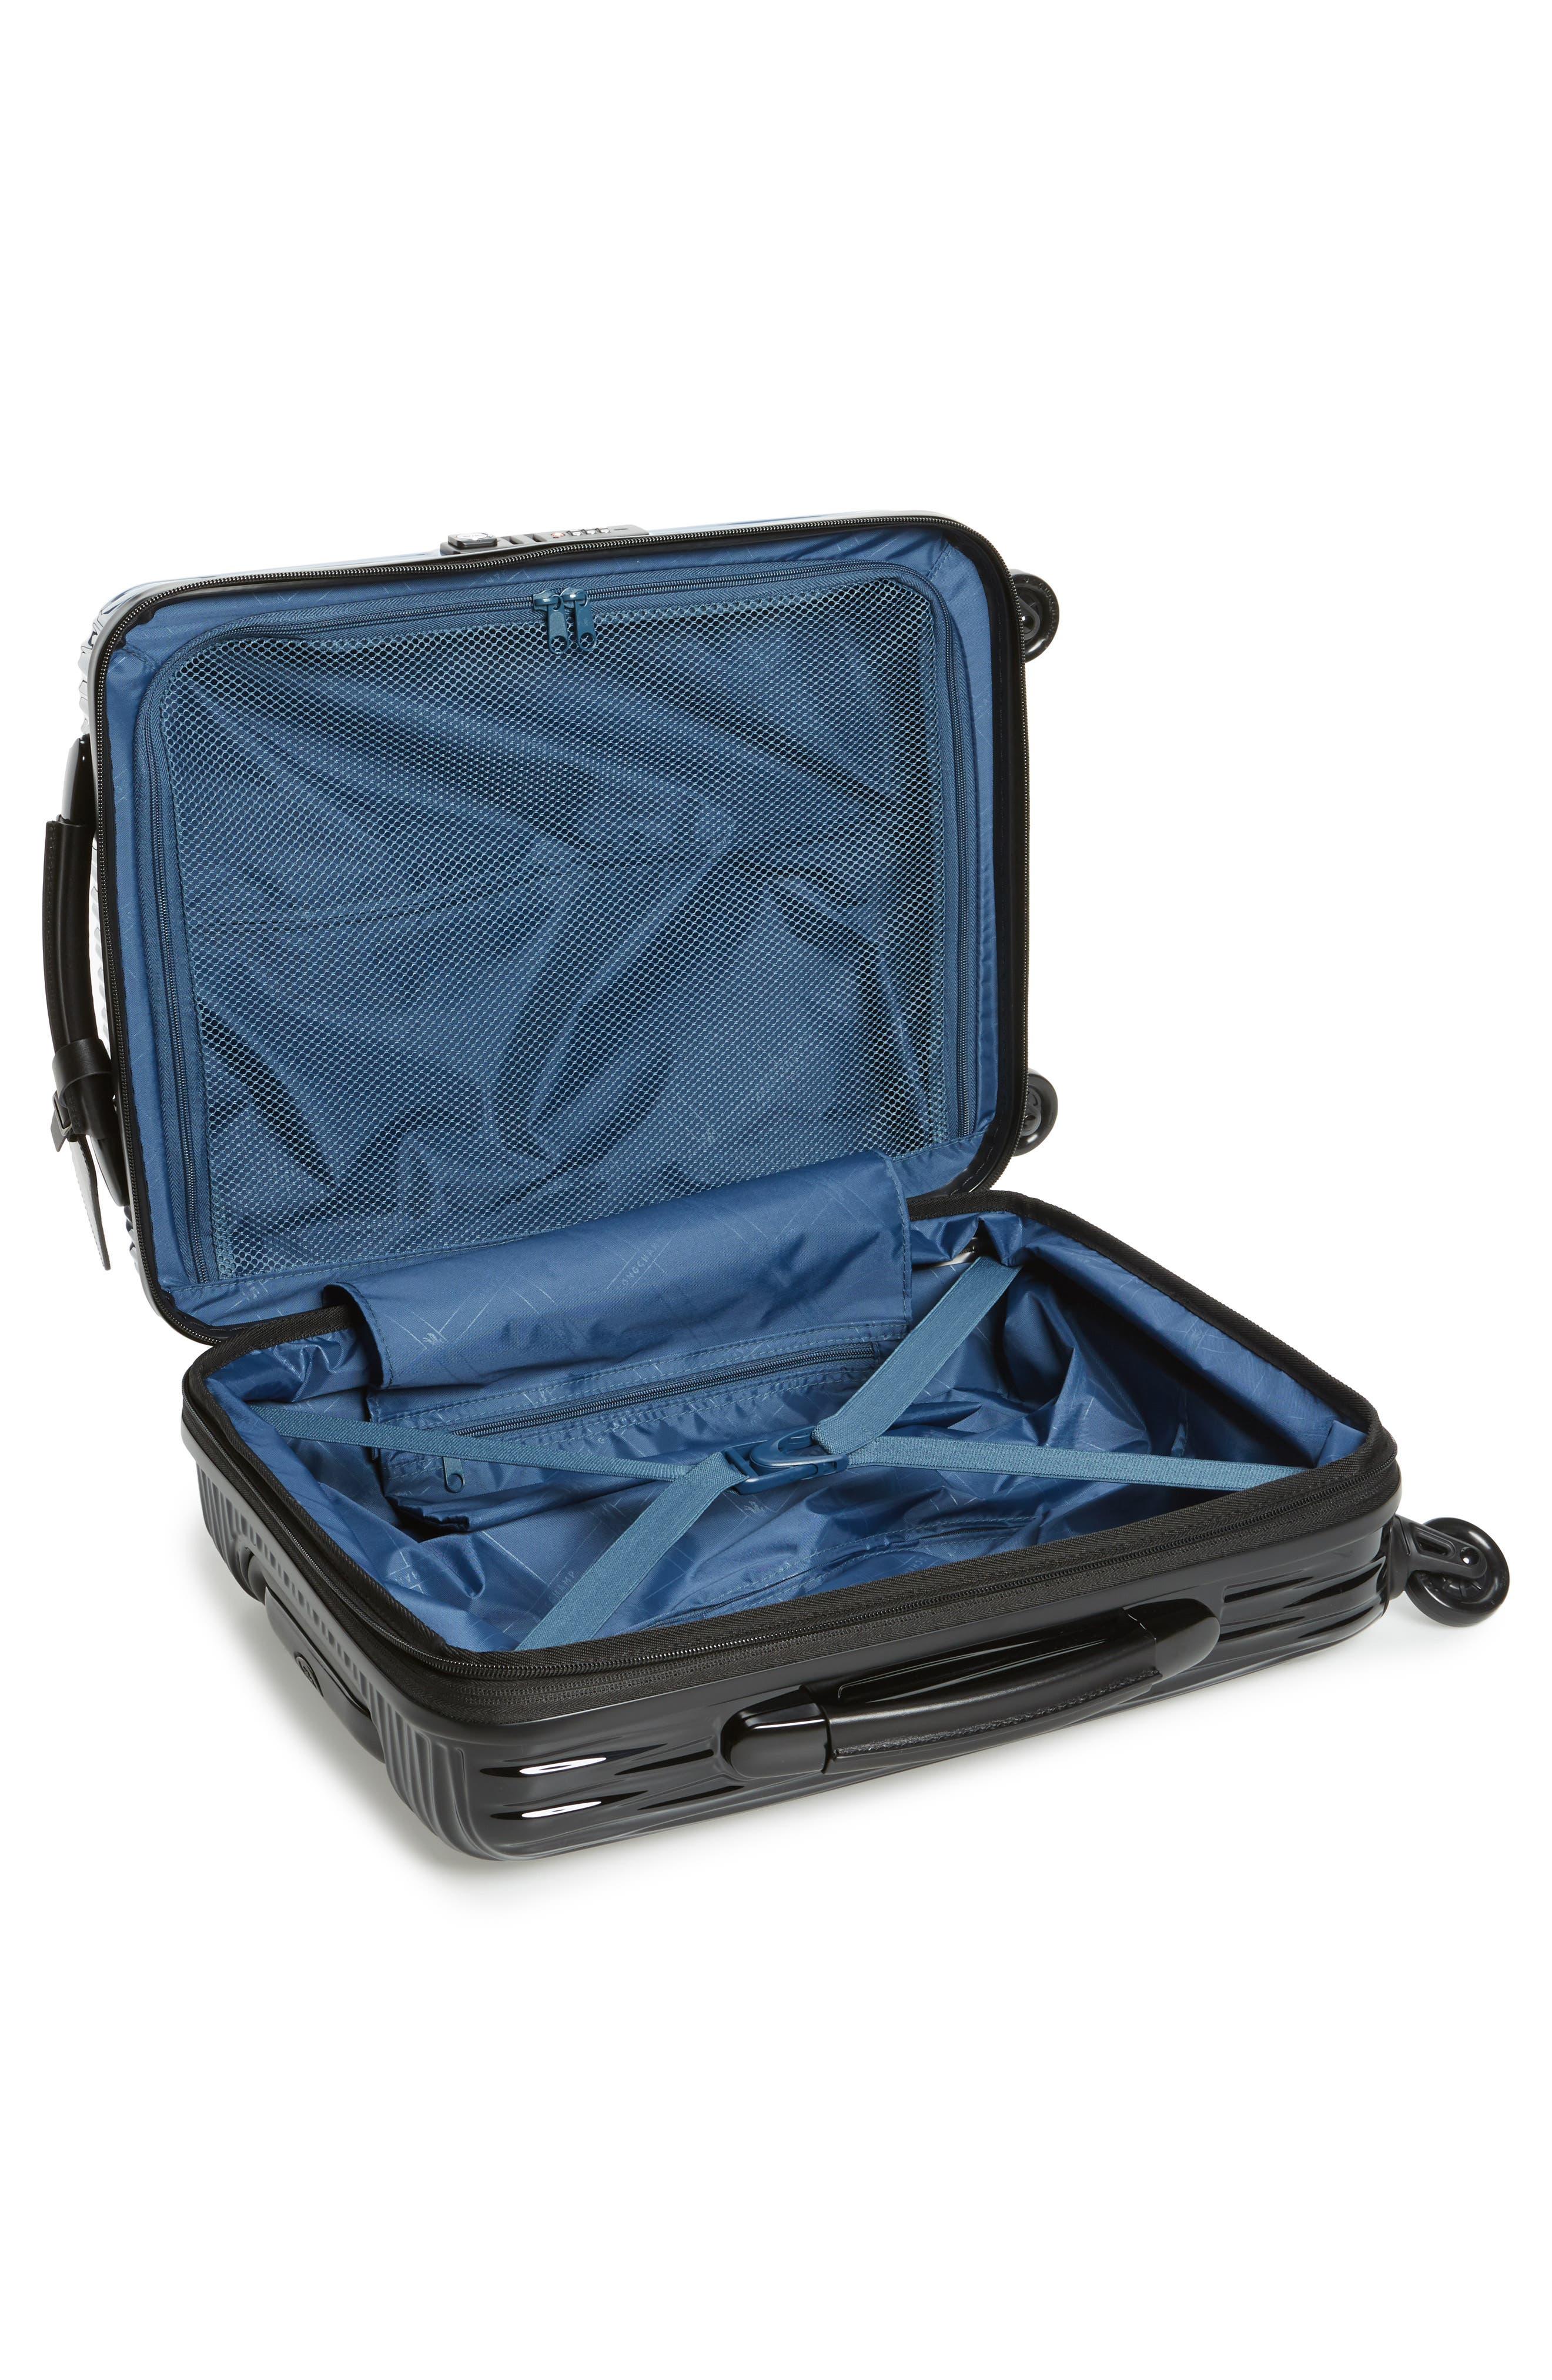 Ruban 22-Inch Four-Wheel Hard Shell Suitcase,                             Alternate thumbnail 2, color,                             Blk/ Pilblue